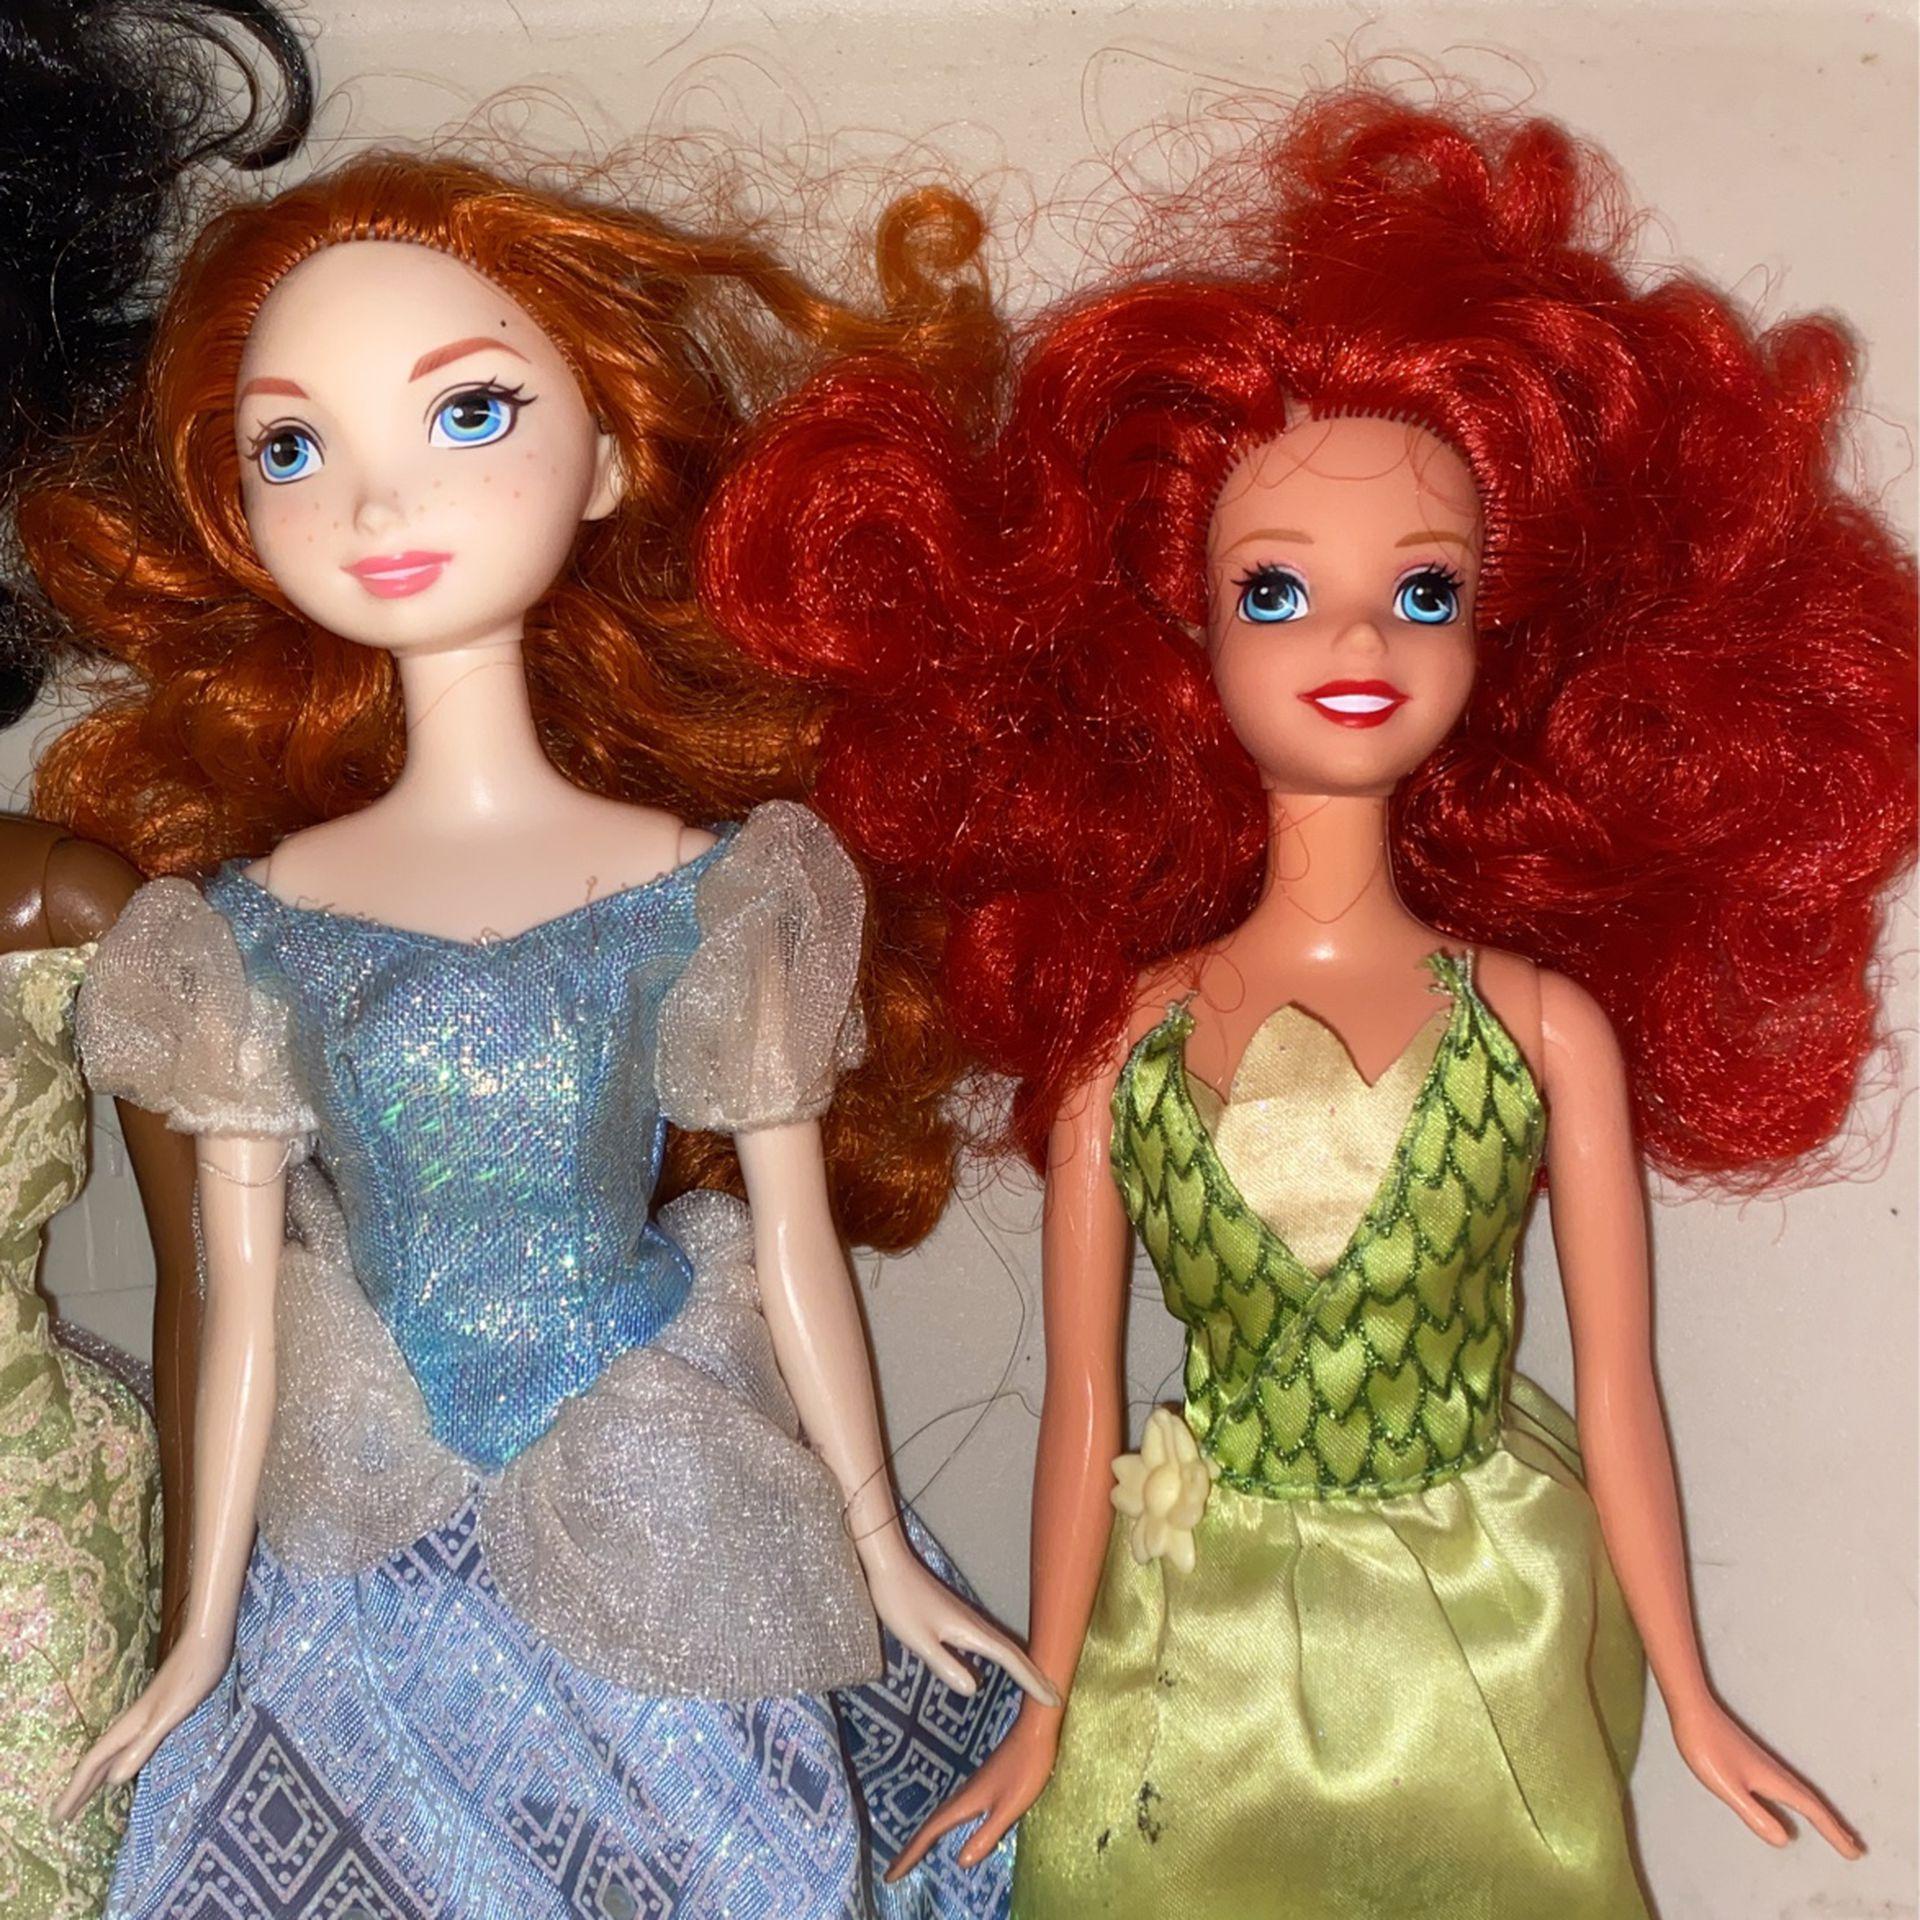 Disney Princess Dolls All 5 For $10